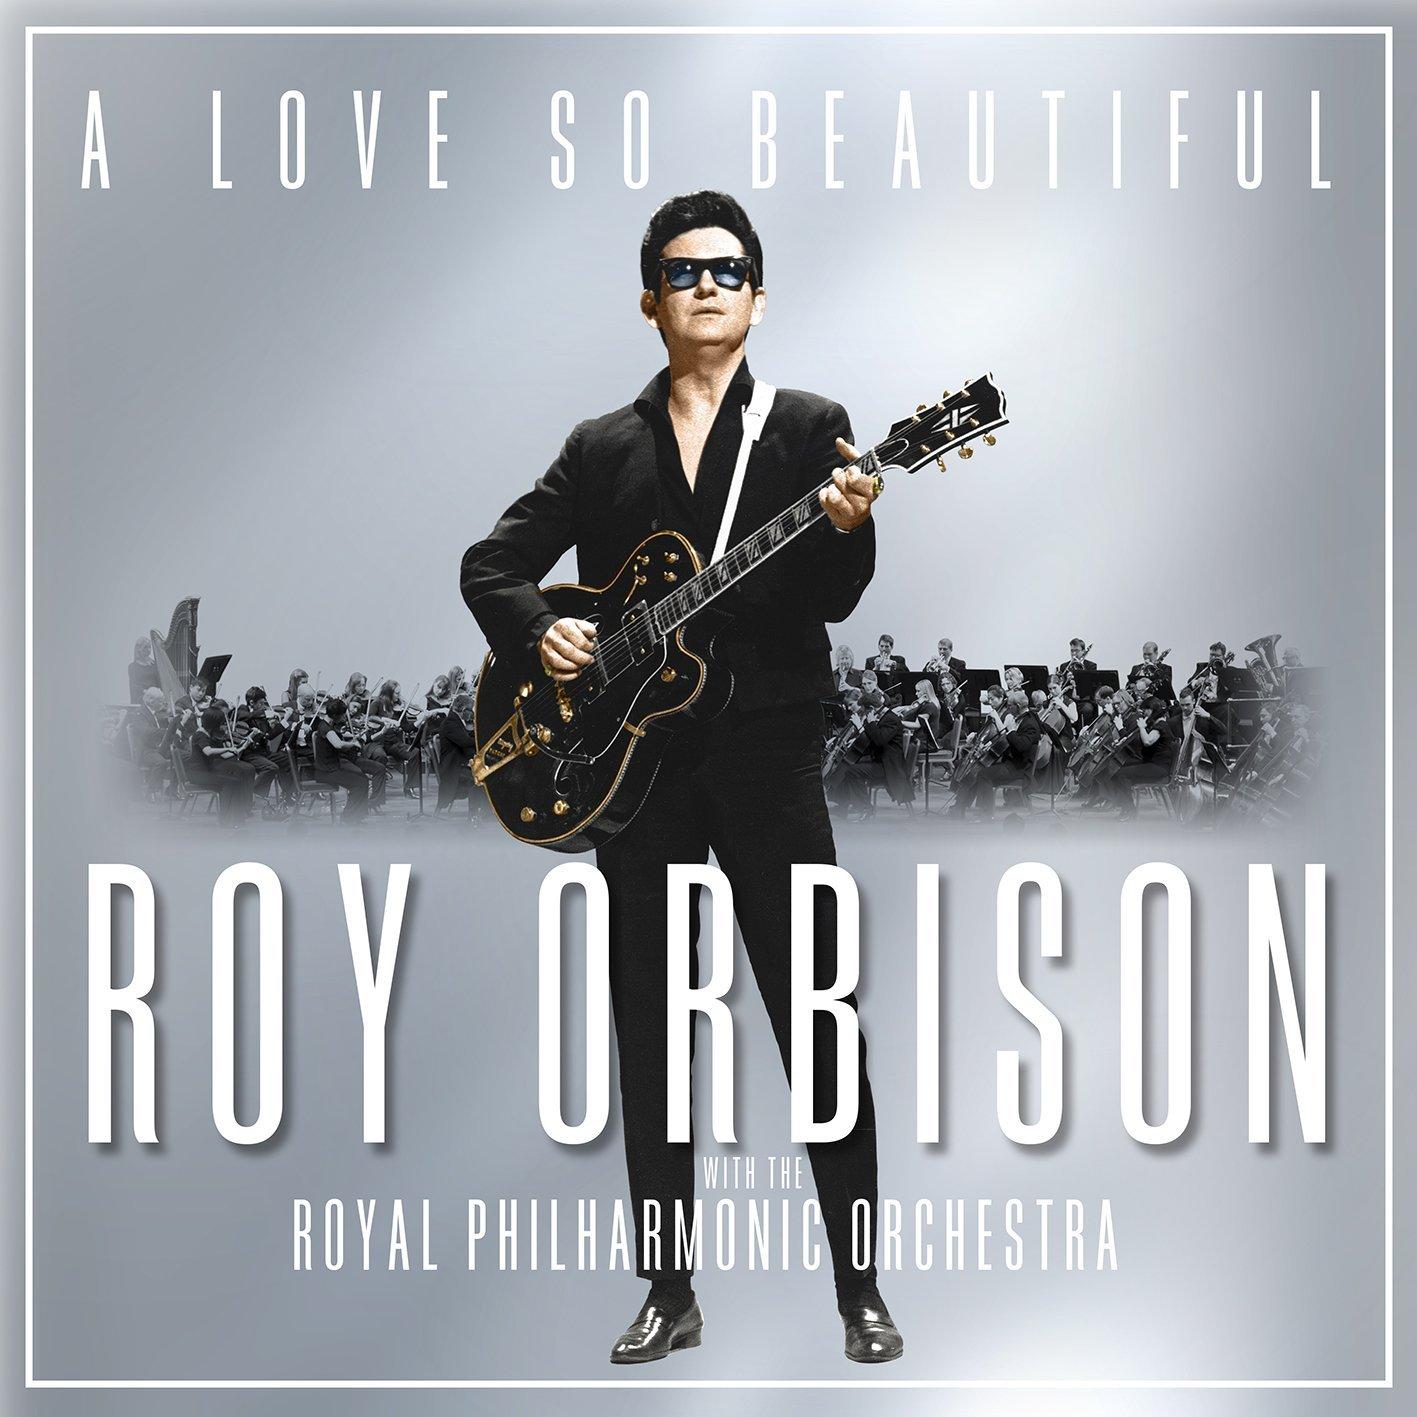 Orbison Royal Philharmonic